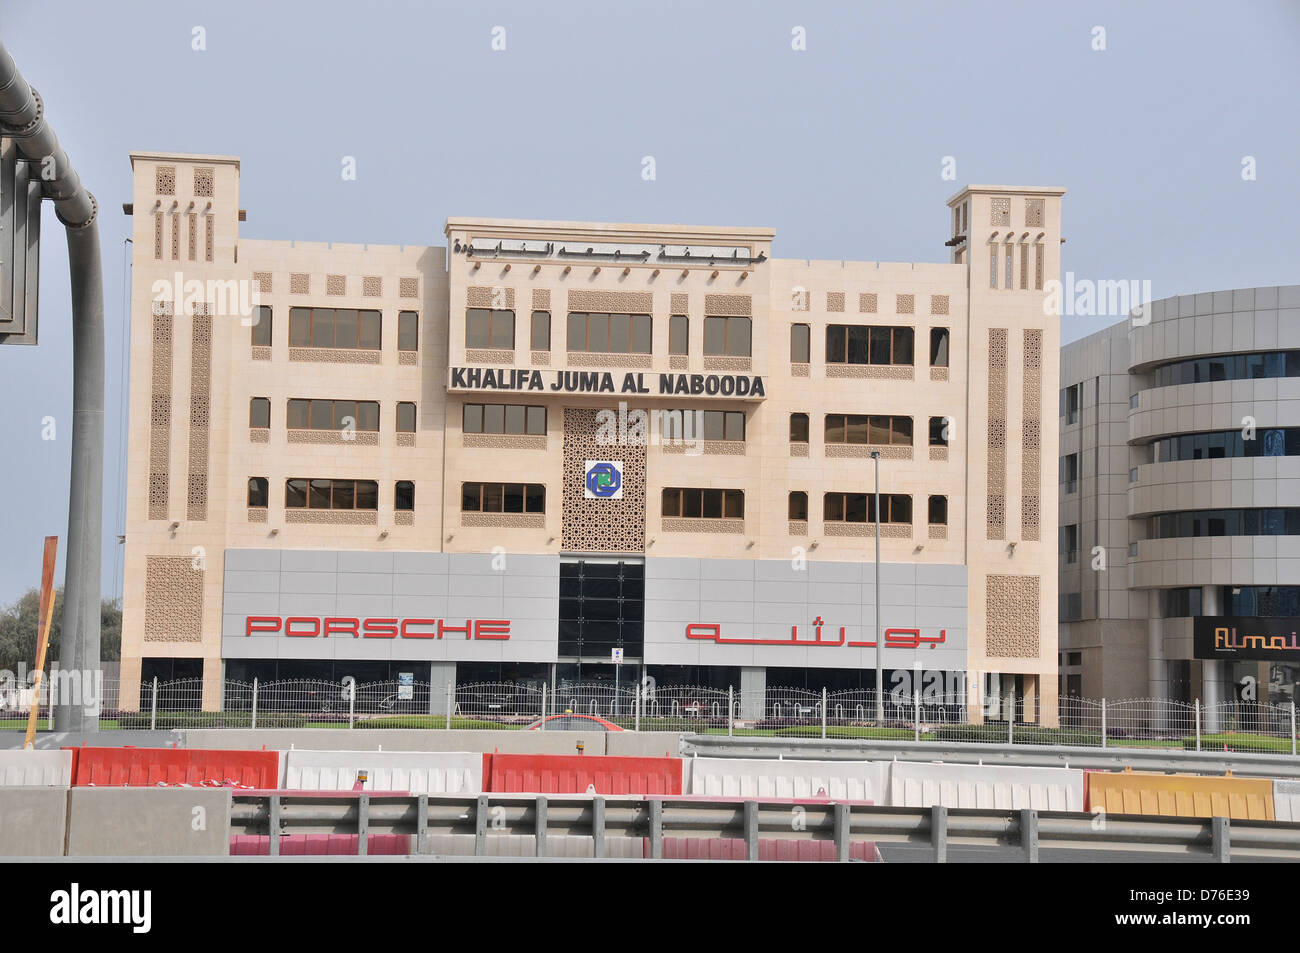 Porsche office Khalifa Juma Al Nabooda Dubai UAE - Stock Image